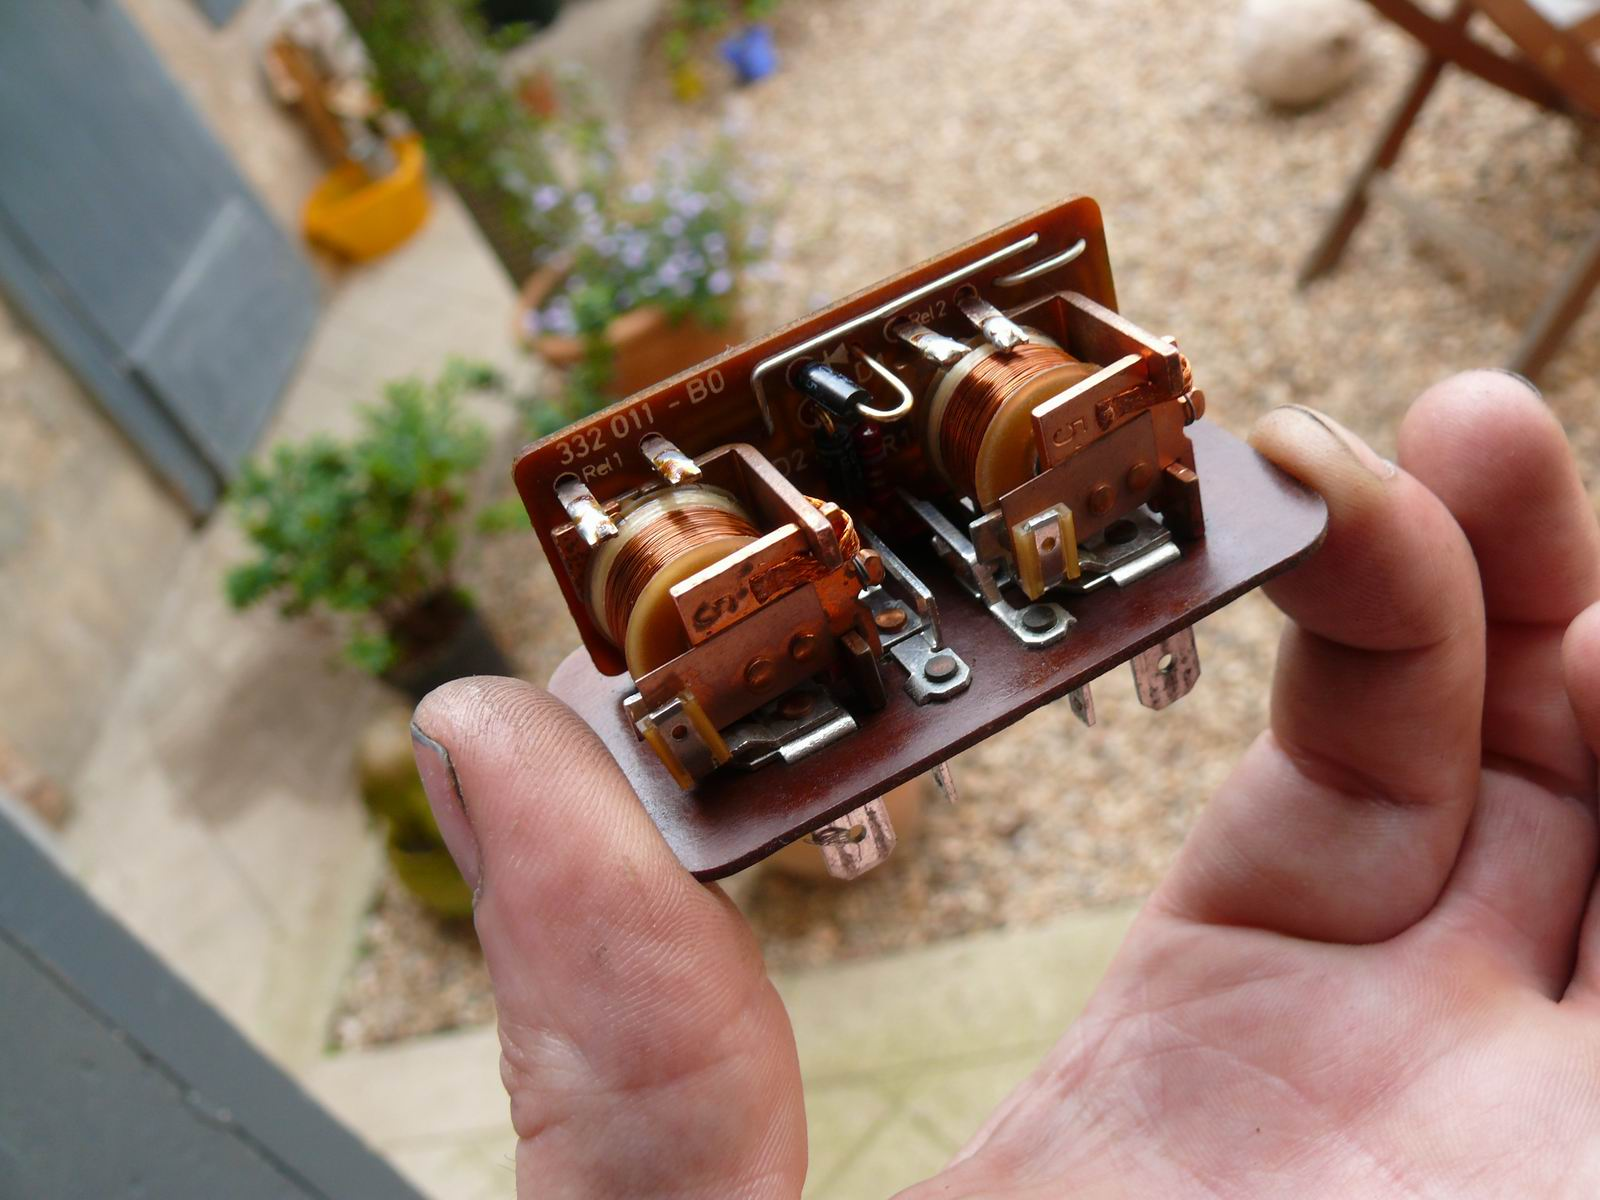 relais-combo-02.jpg